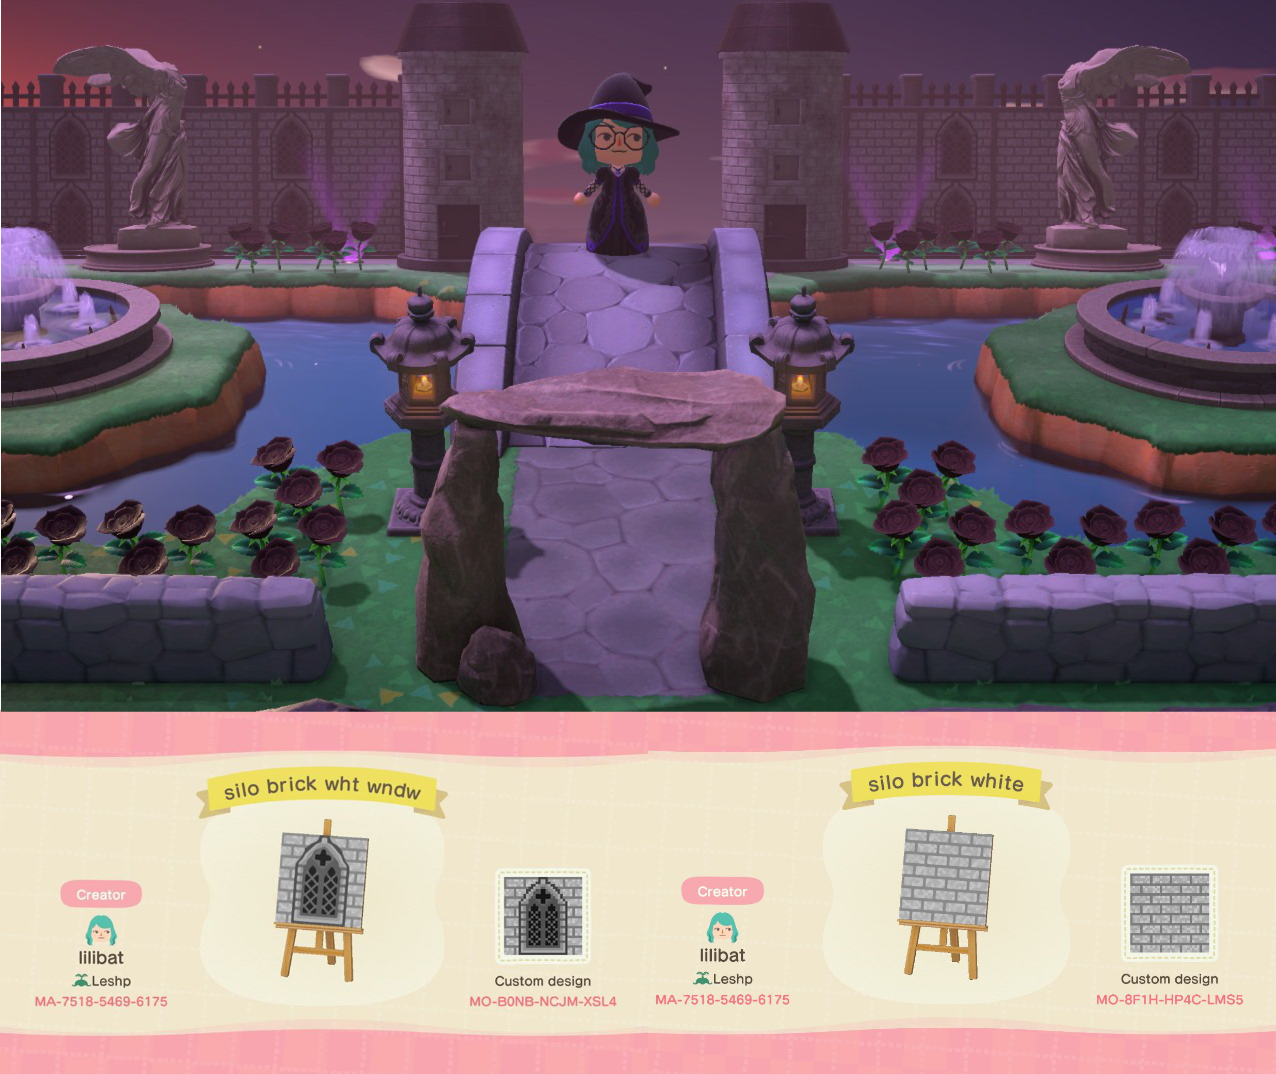 Wedding Event In Animal Crossing New Horizons In 2020 Animal Crossing Animals Secret Song